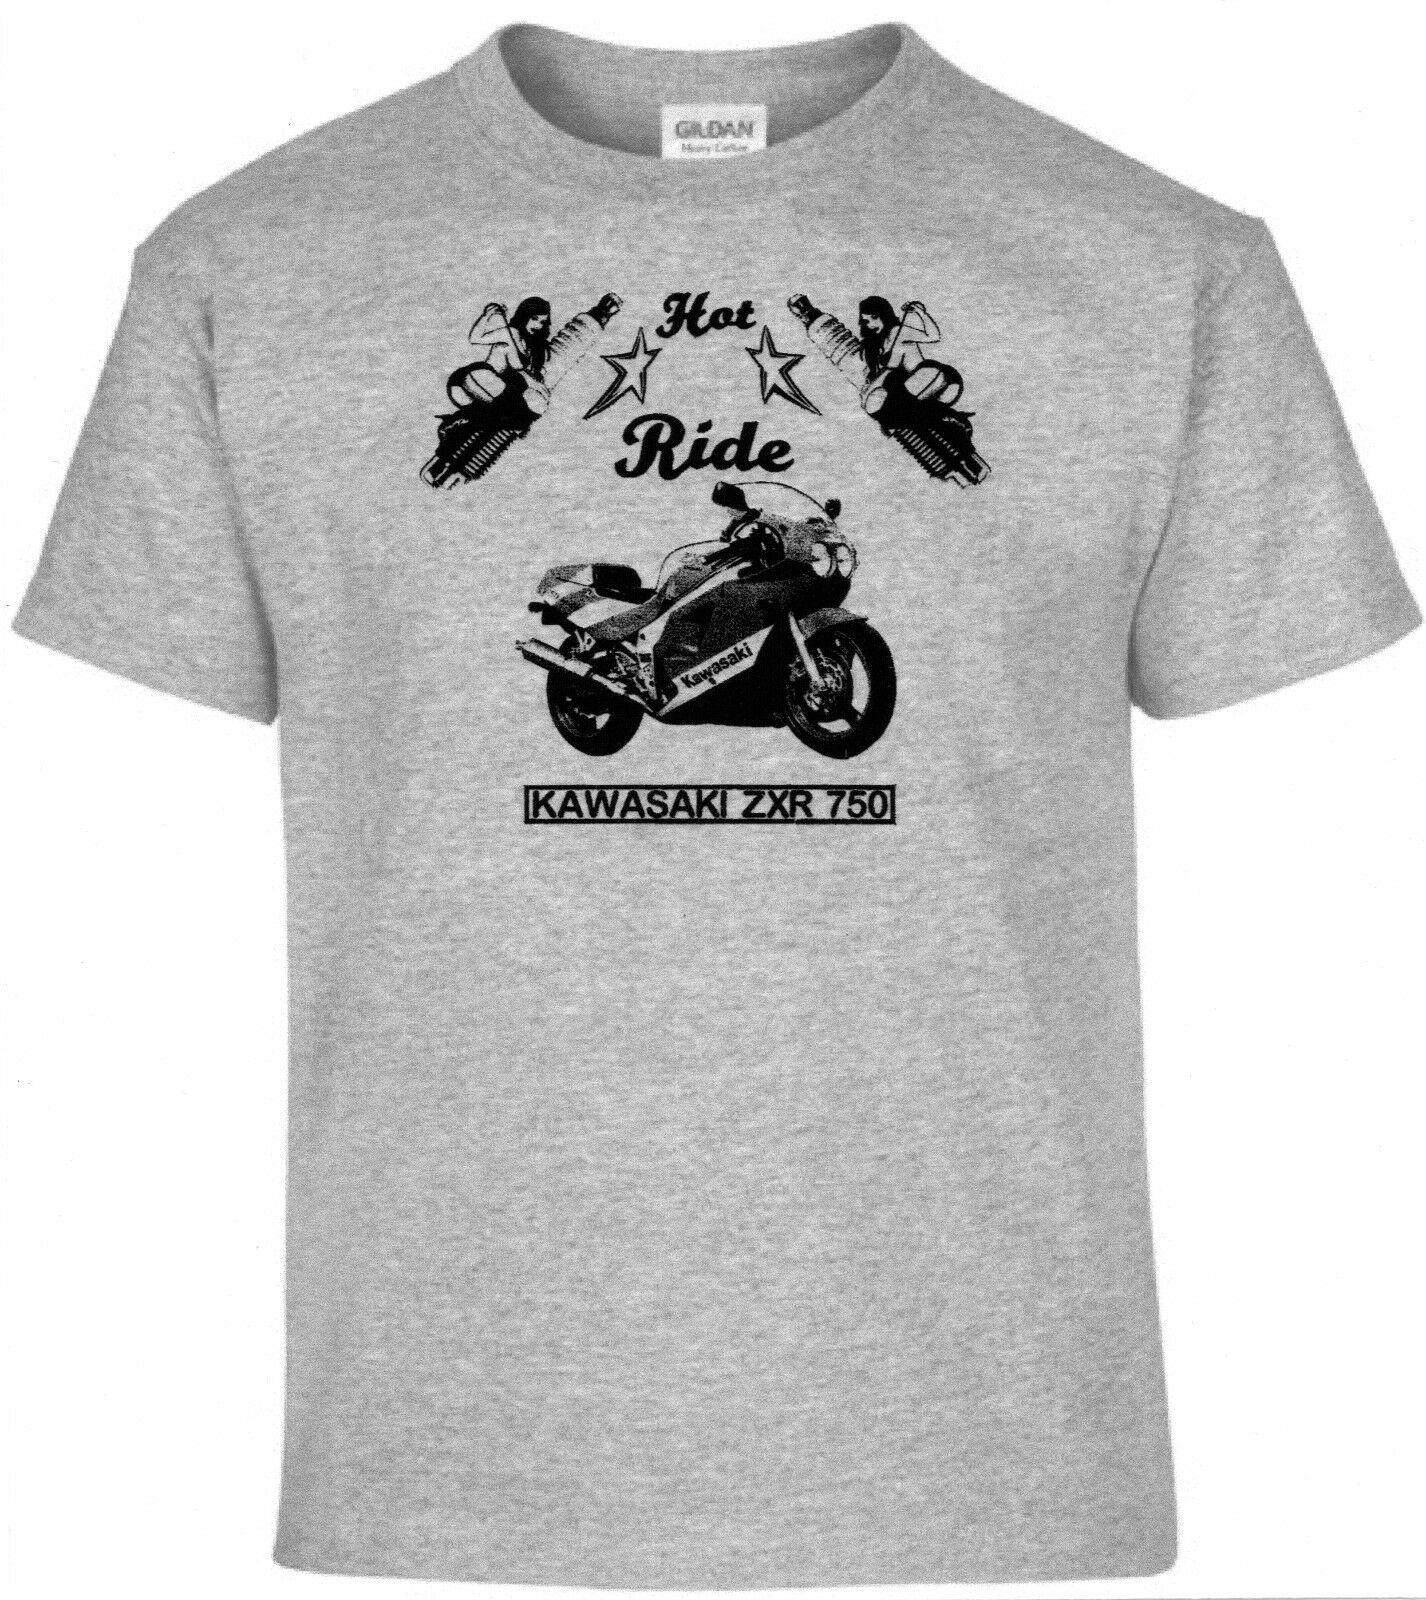 Bike kawasaki zxr 750 T-shirt motocicleta Oldtimer Youngtimer,